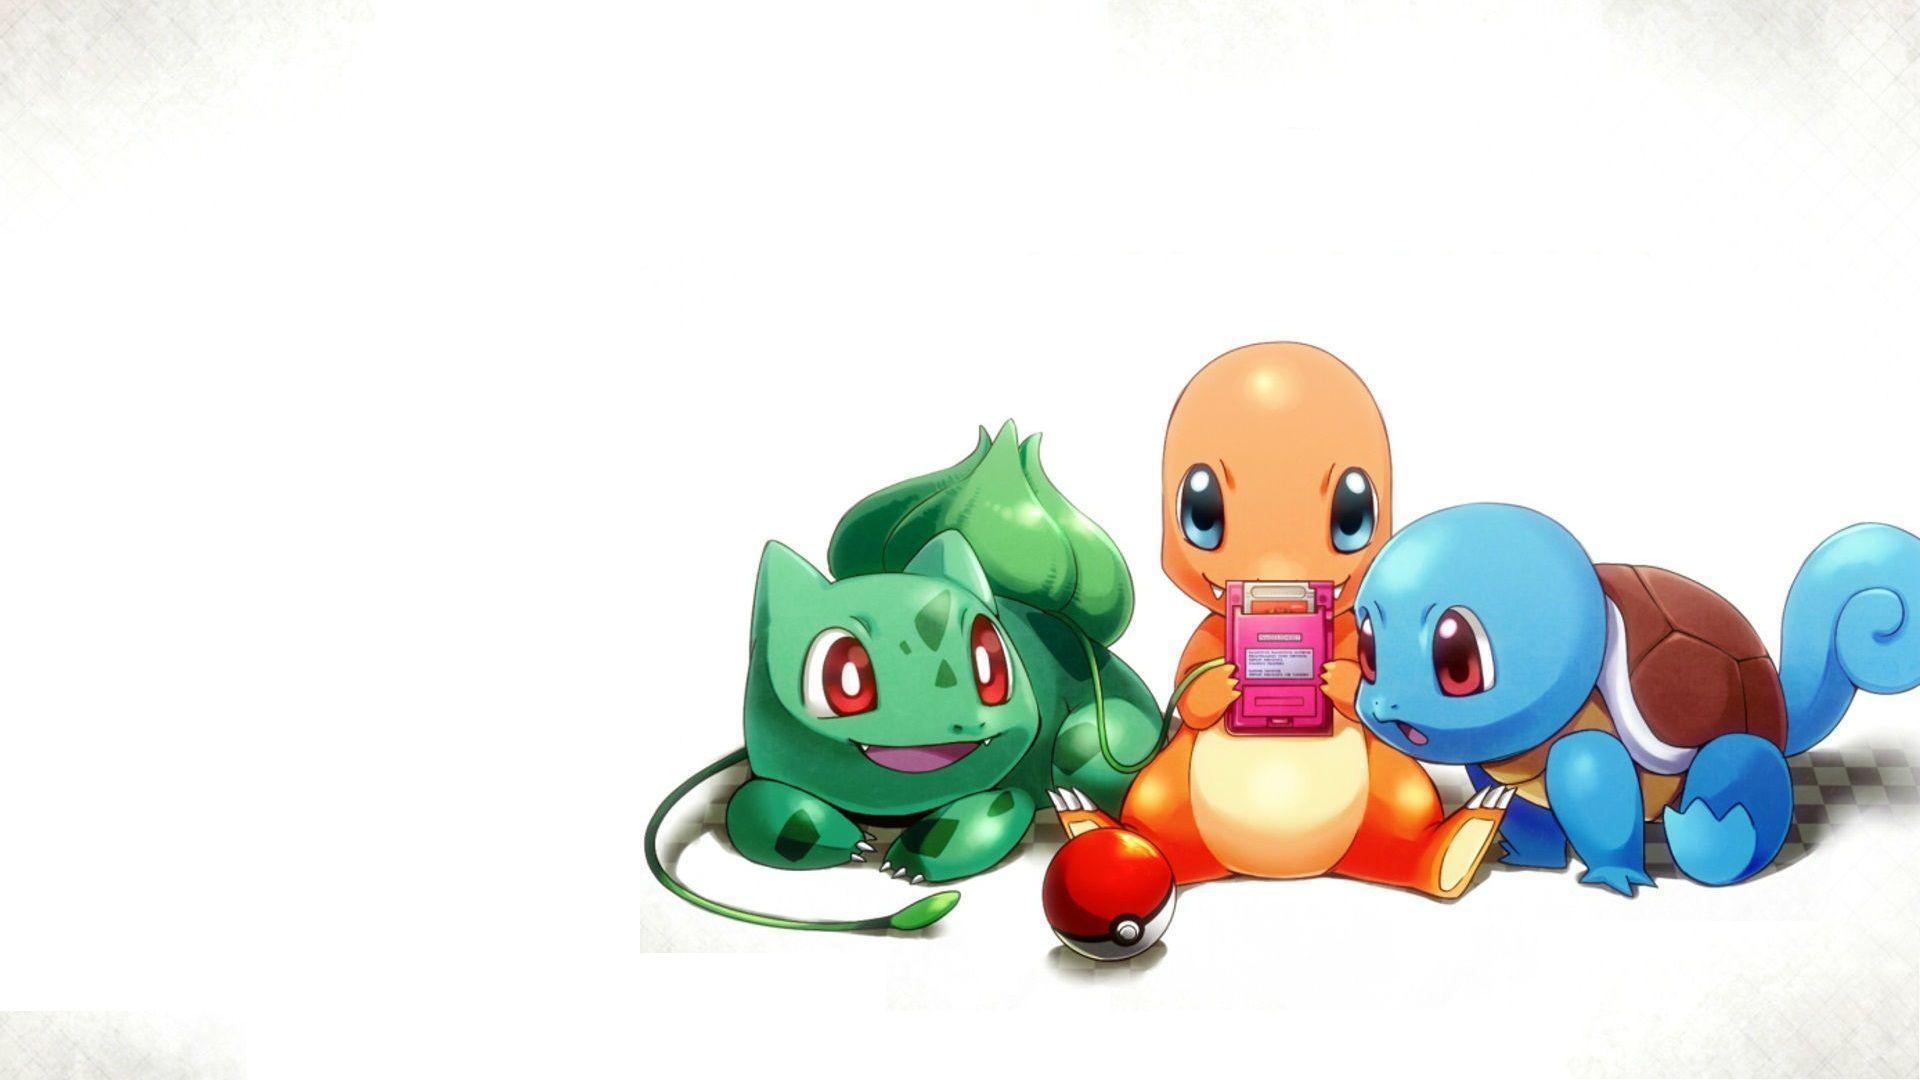 Pokémon Wallpapers HD - Wallpaper Cave